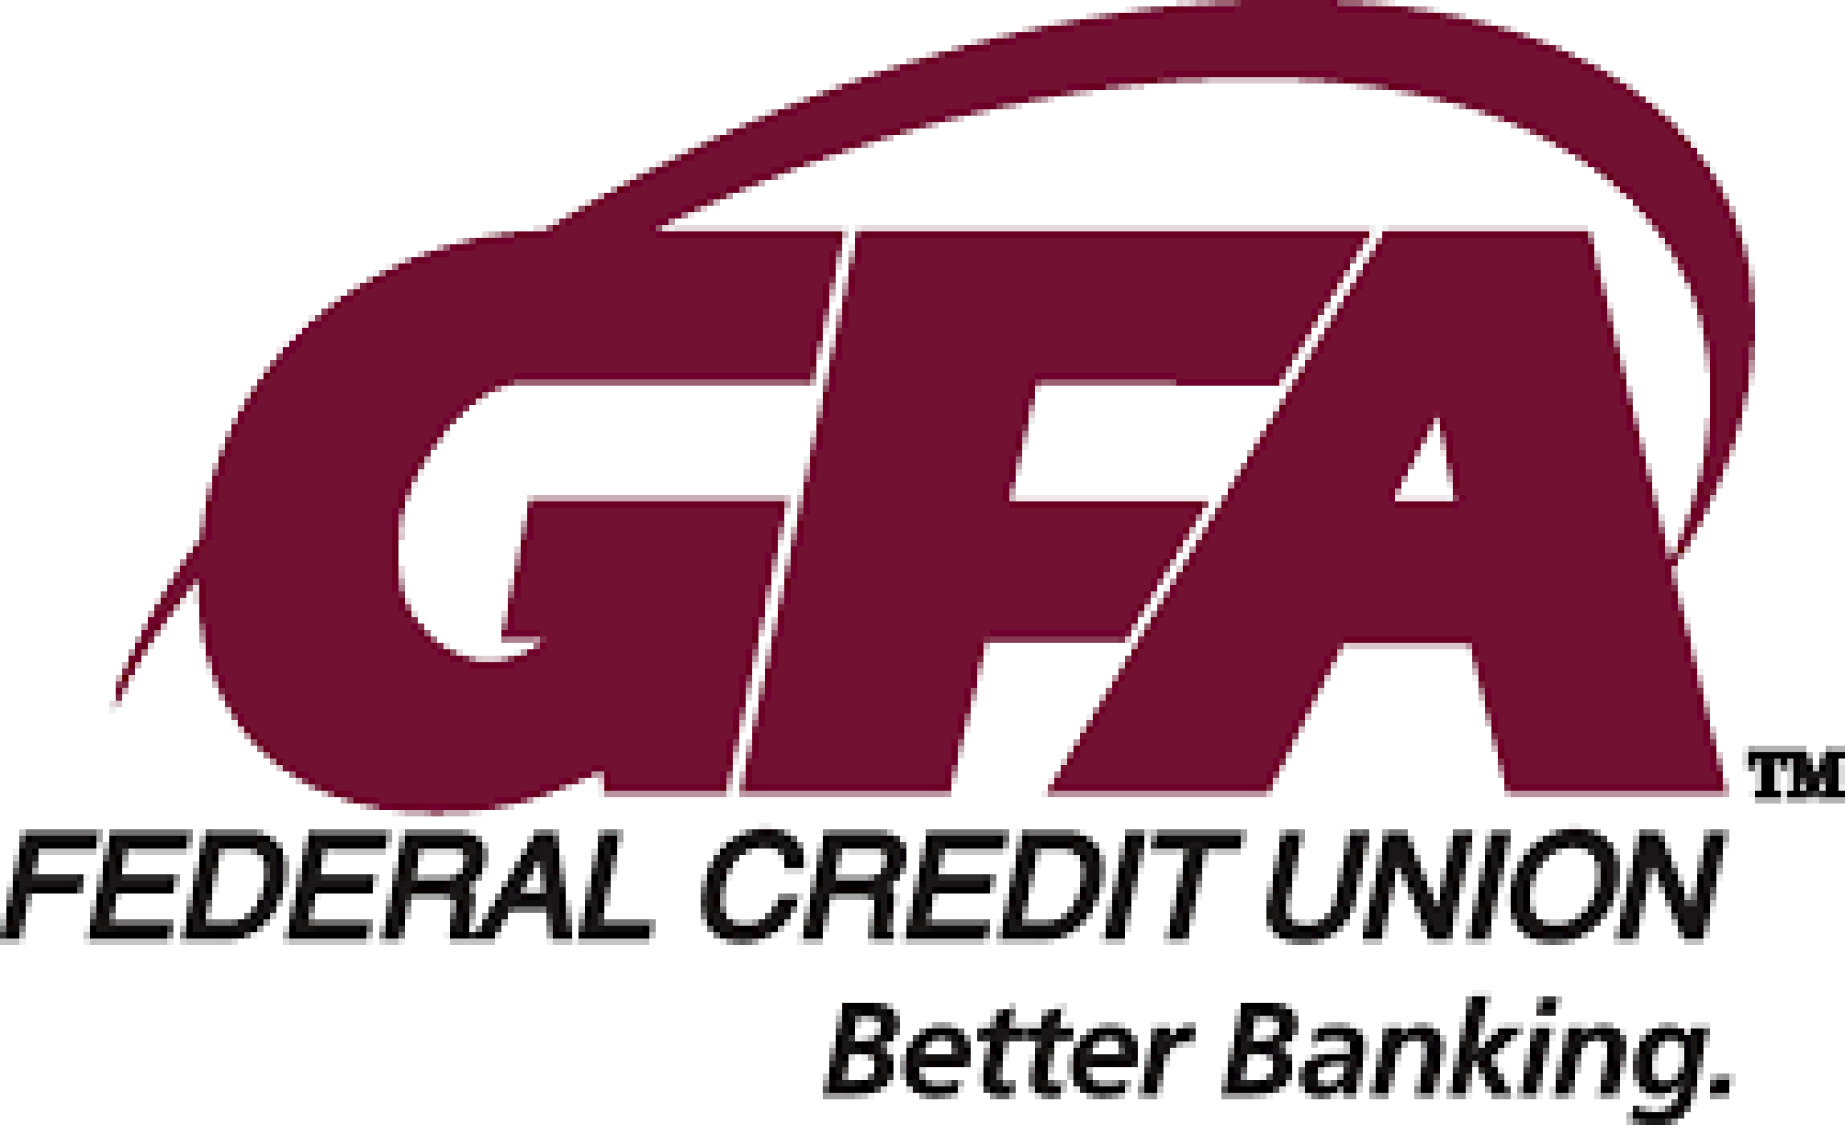 Gfa credit union logo